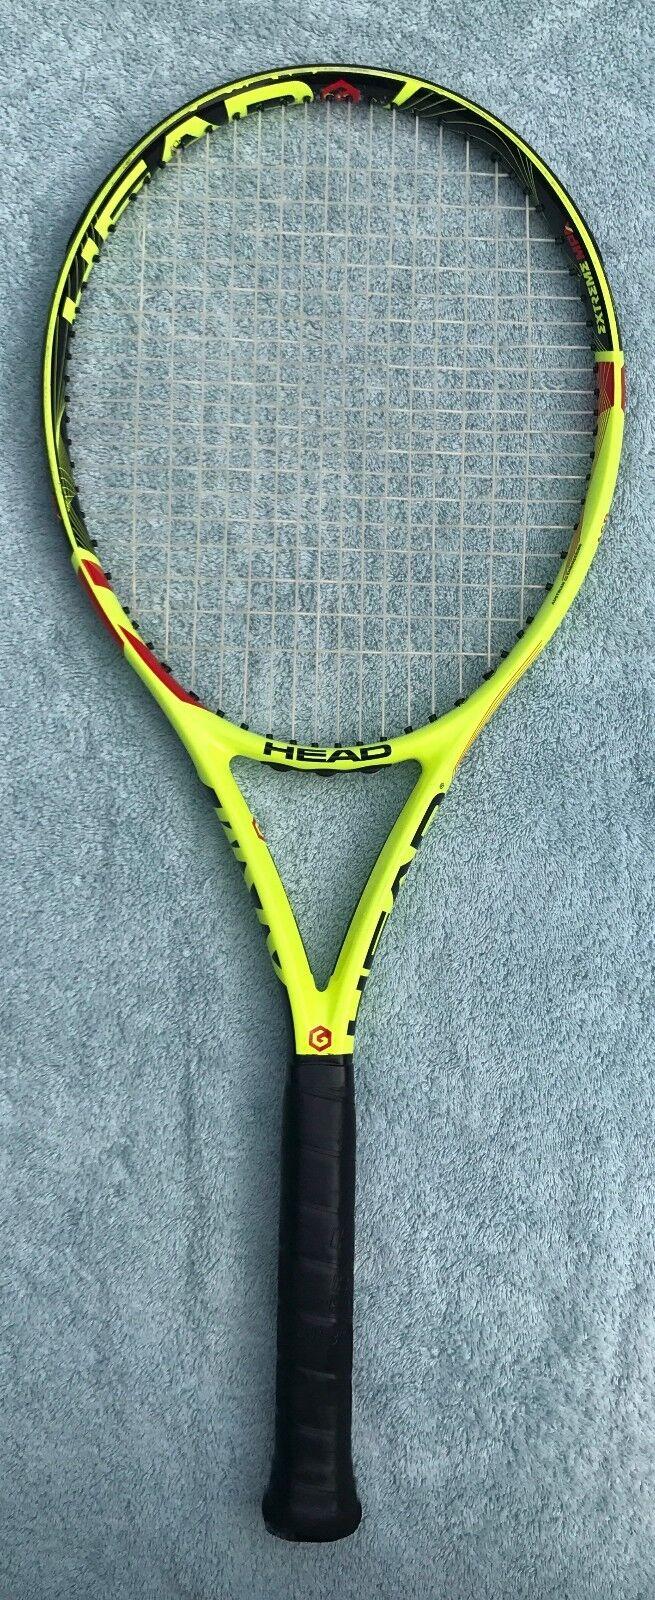 Head Graphene Xt Extreme MPA Tenis  Raqueta Agarre (4 1 4 = L2) Usado, Buen Estado     con 60% de descuento